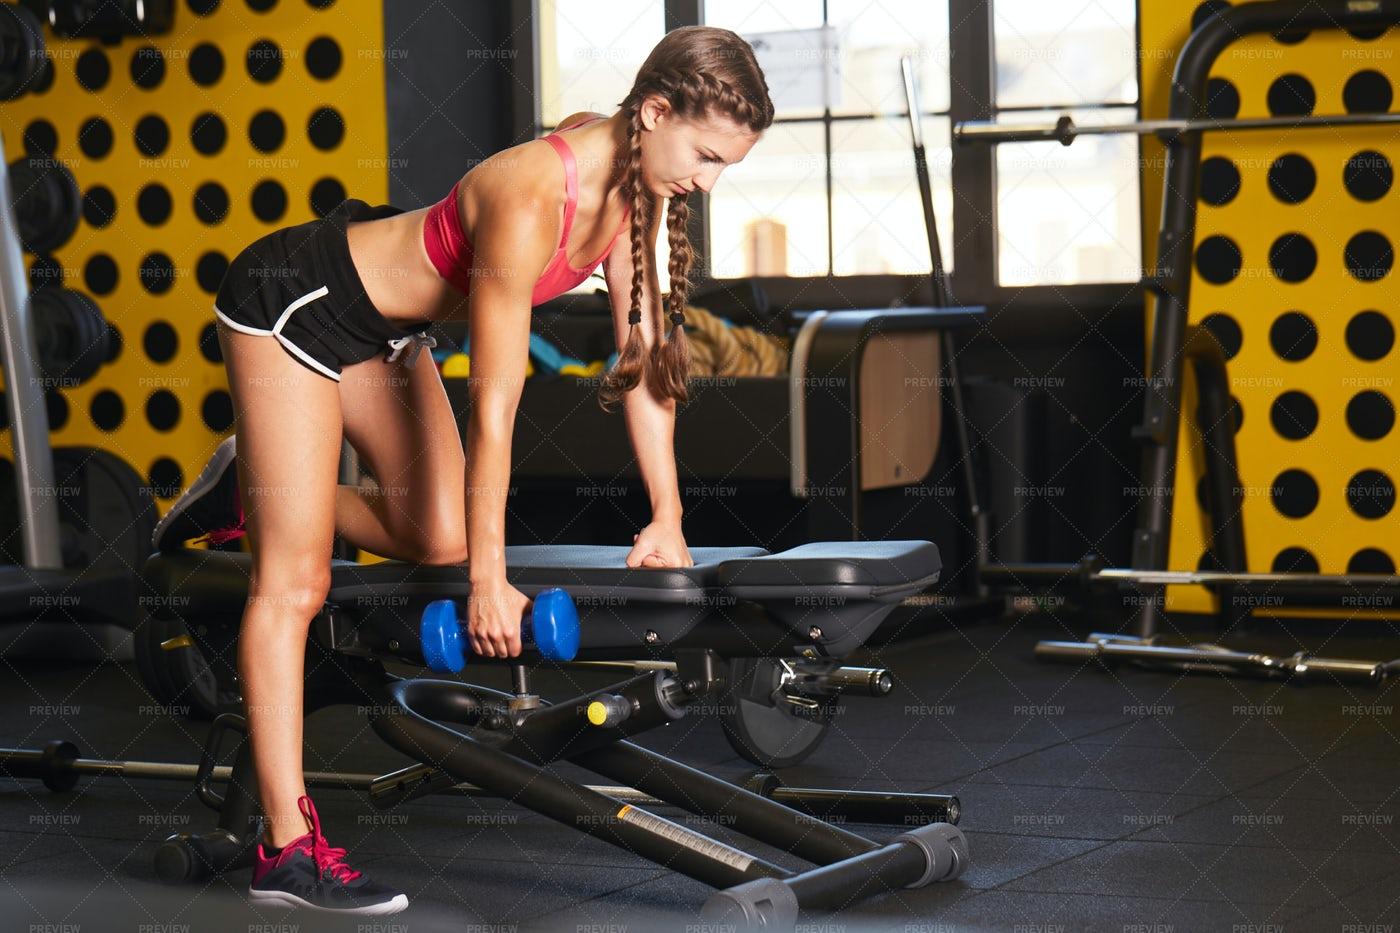 Body Building Workout At Gym: Stock Photos